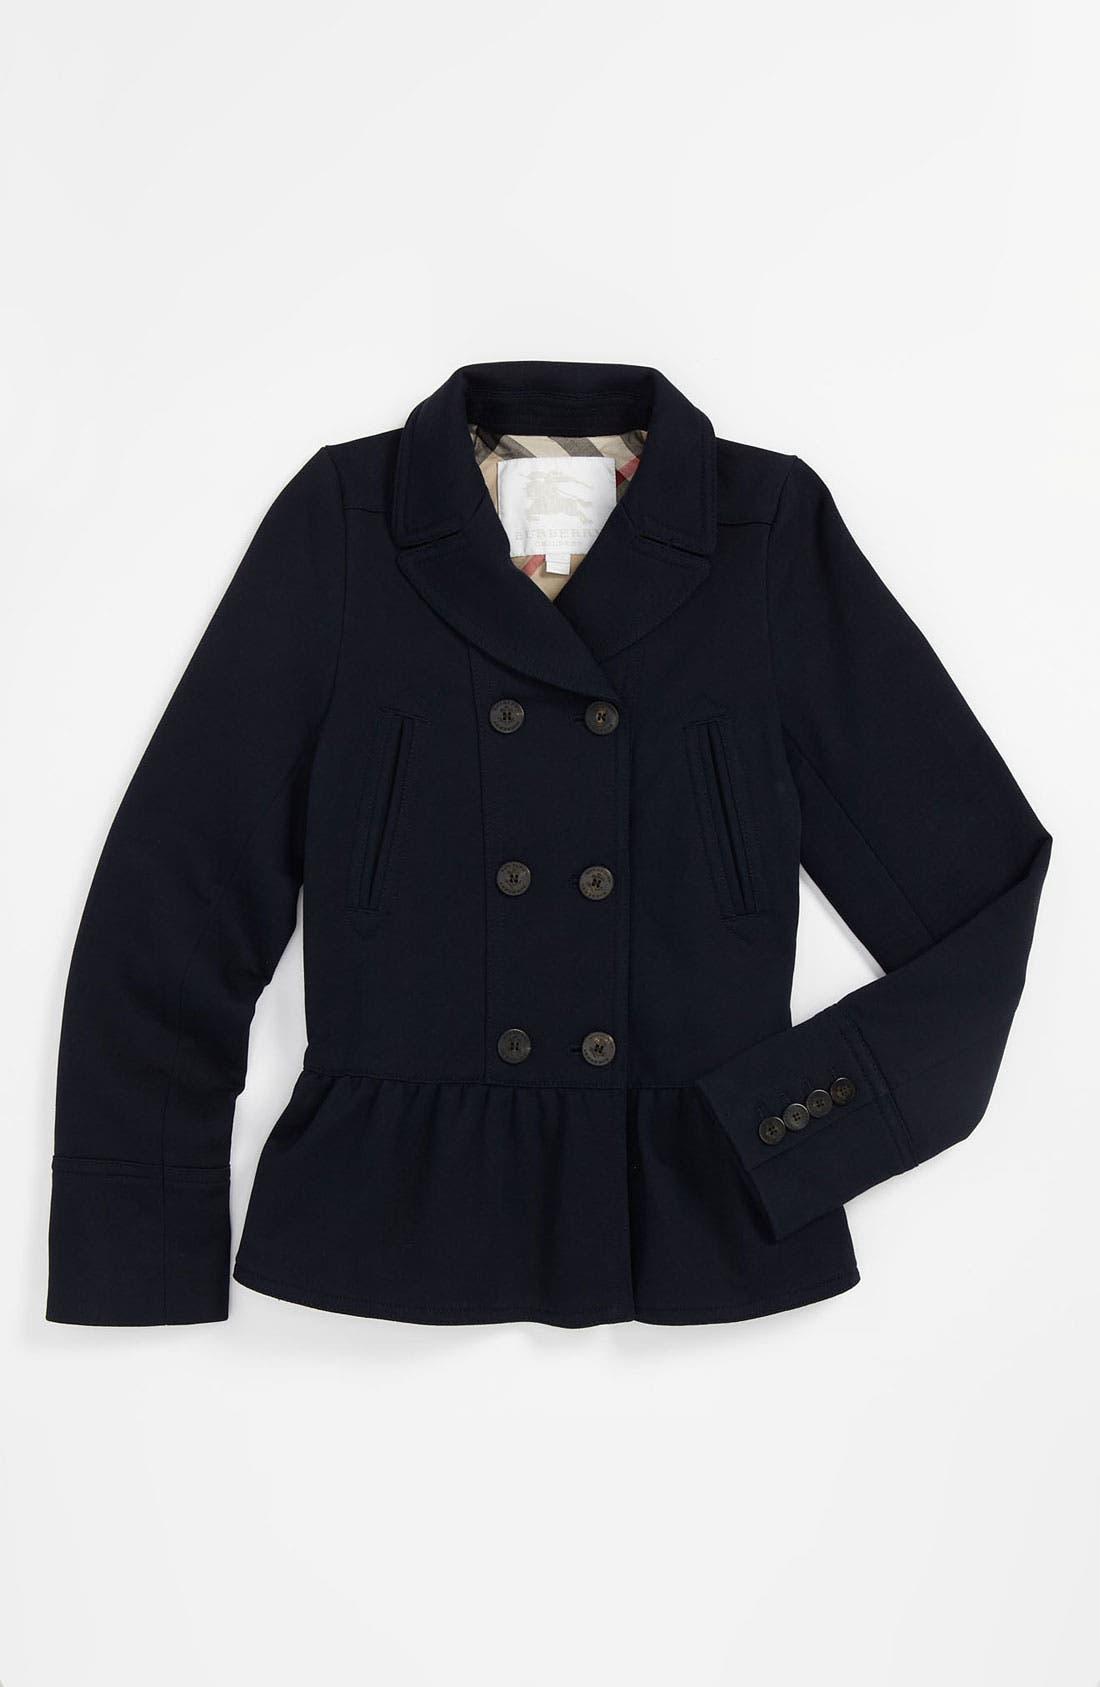 Alternate Image 1 Selected - Burberry 'Janetta' Knit Jacket (Little Girls & Big Girls)